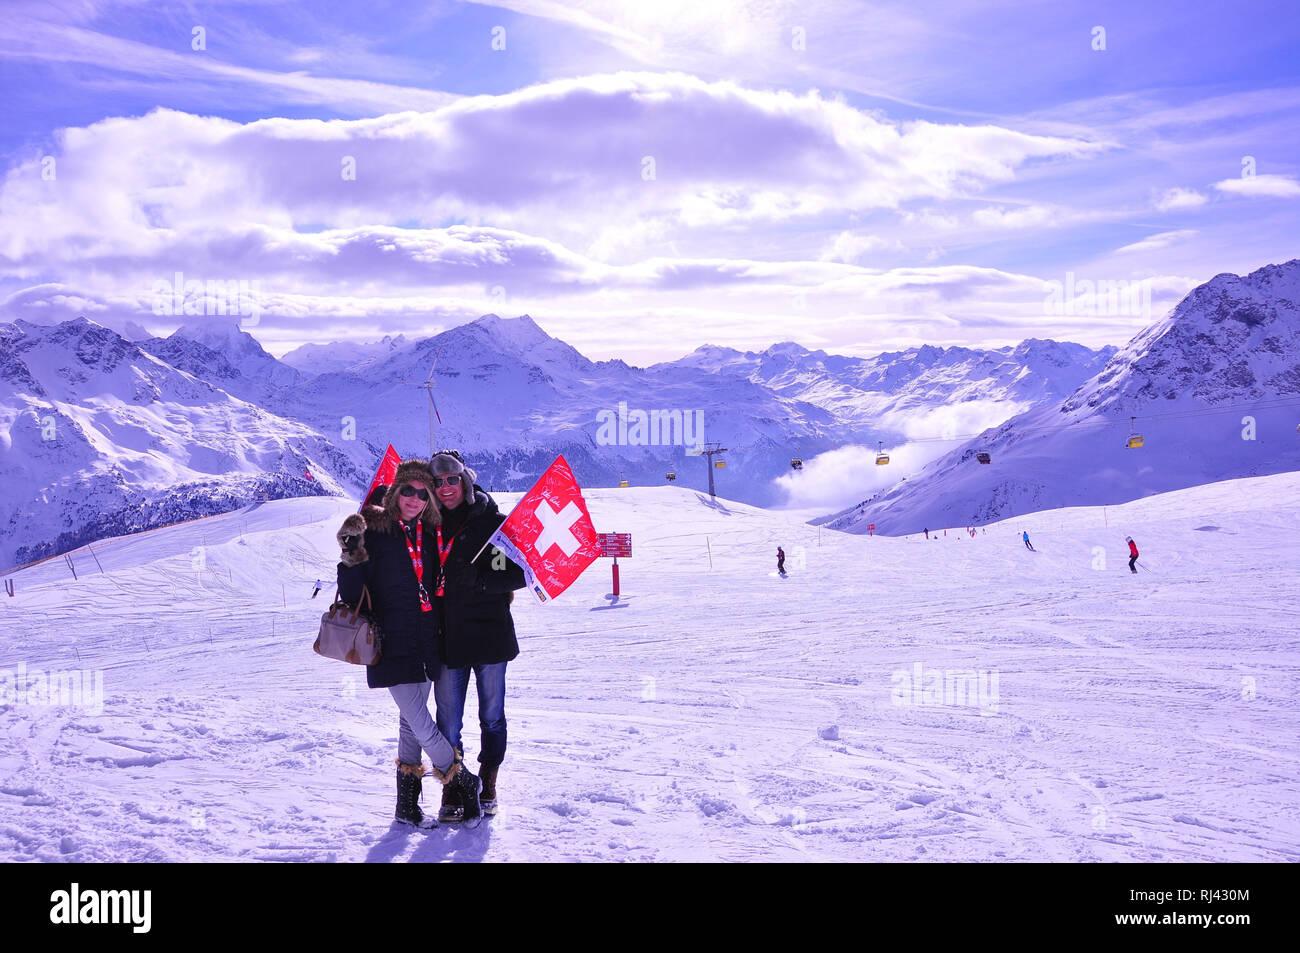 Schweiz, Graub¸nden, Engadin, Sankt Moritz, Corviglia, Skipiste, Touristen, Schweizer Flagge, Bergpanorama, Winter, Stock Photo